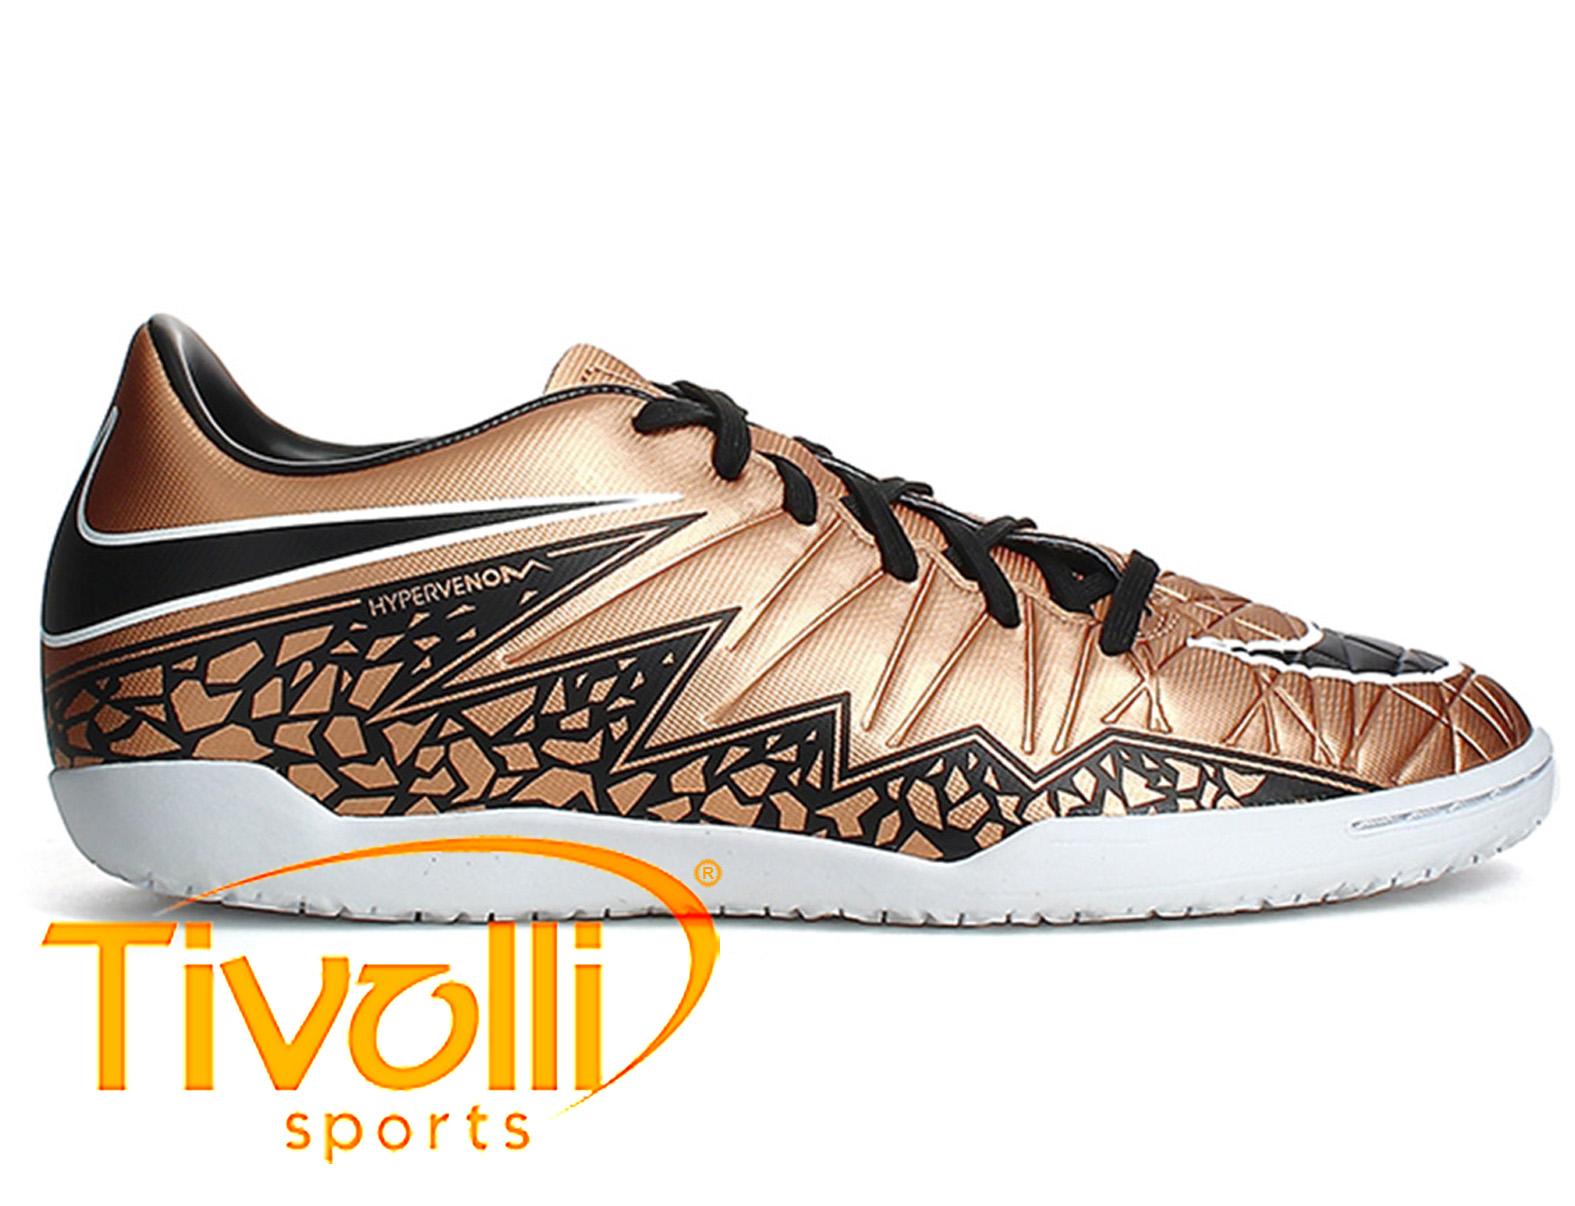 Black Friday - Chuteira Nike JR Hypervenom Phelon II IC futsal bronze 0f24bcdceca36